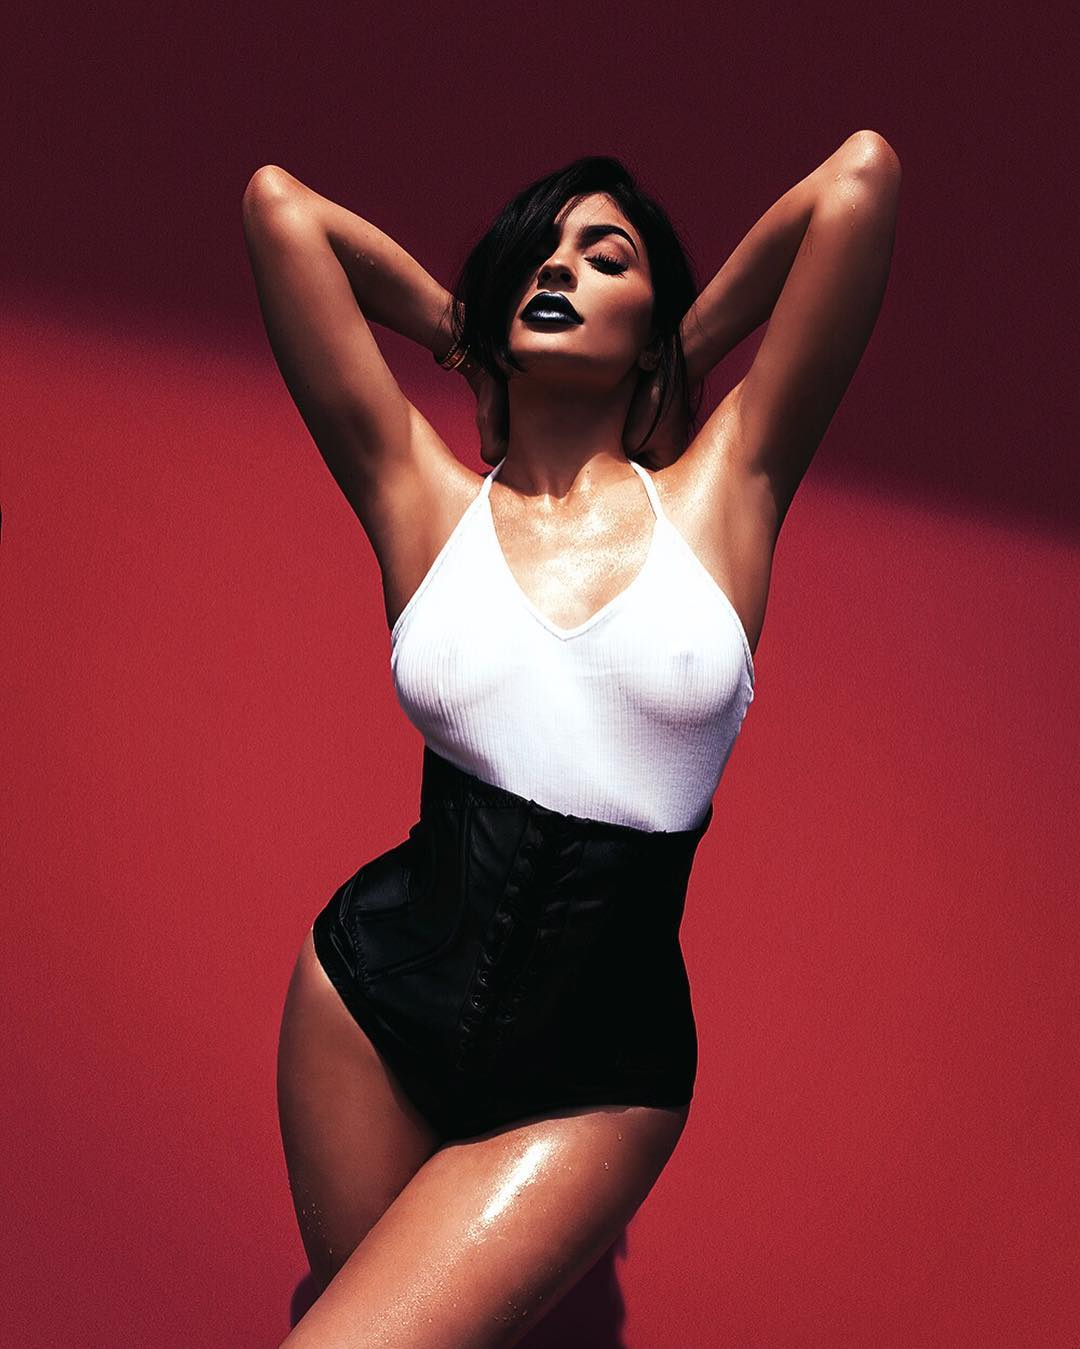 nudes (19 photo), Tits Celebrites fotos